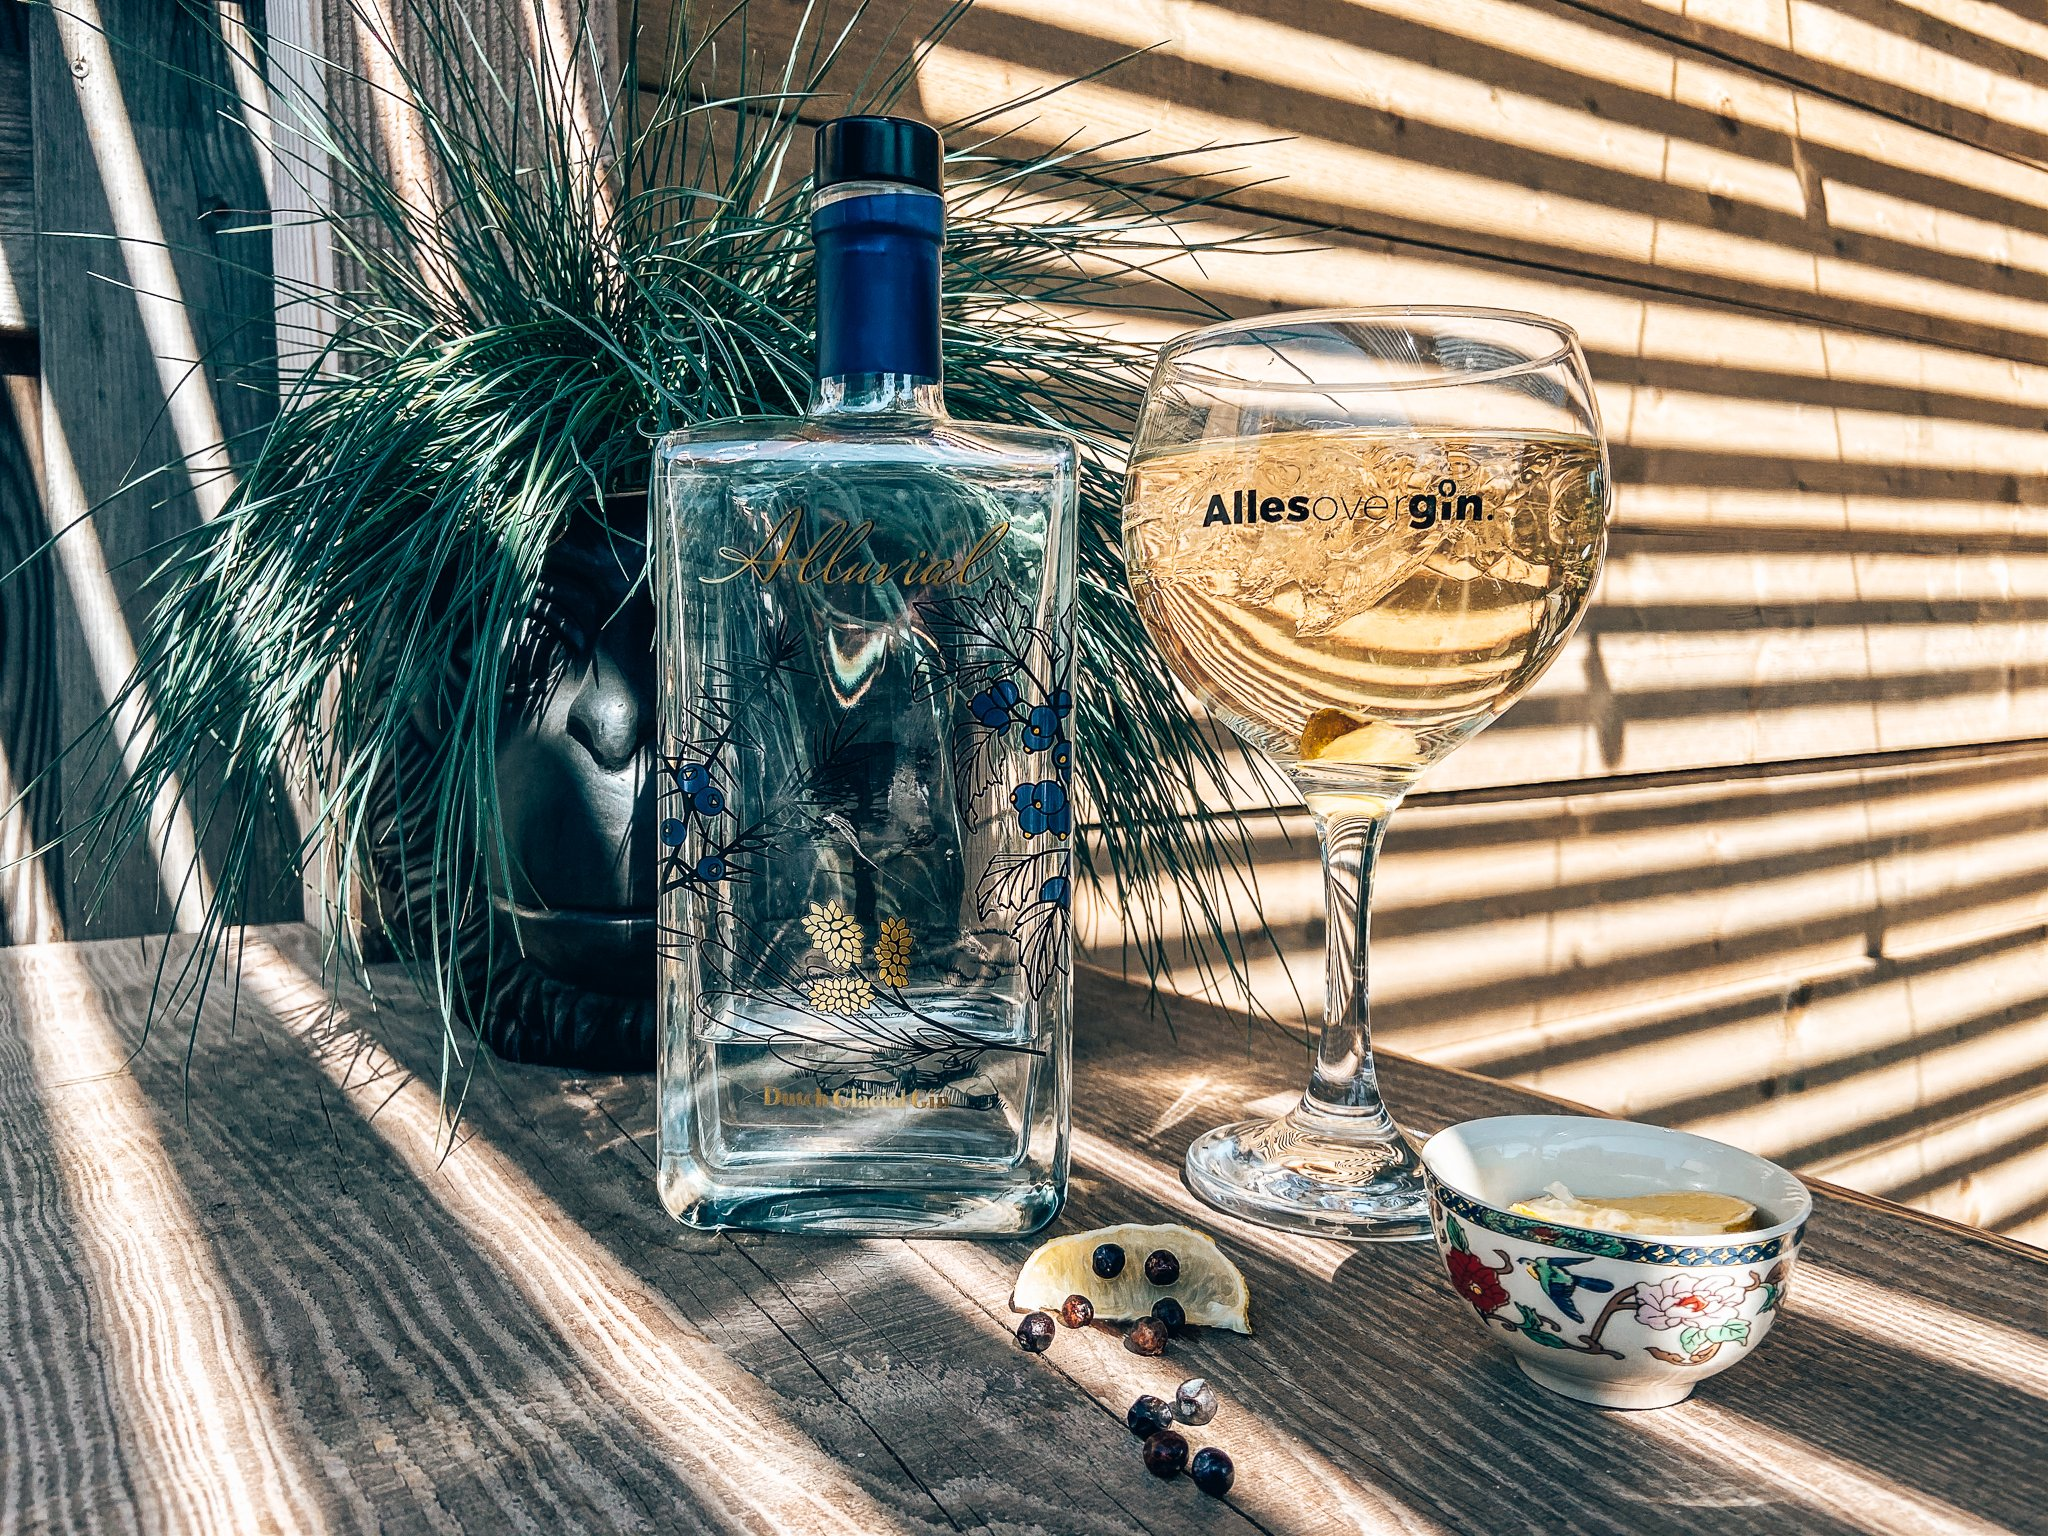 Recept Perfect Alluvial serve, Alluvial Gin, Drumlin Distillery, Havelte, Alles over gin.